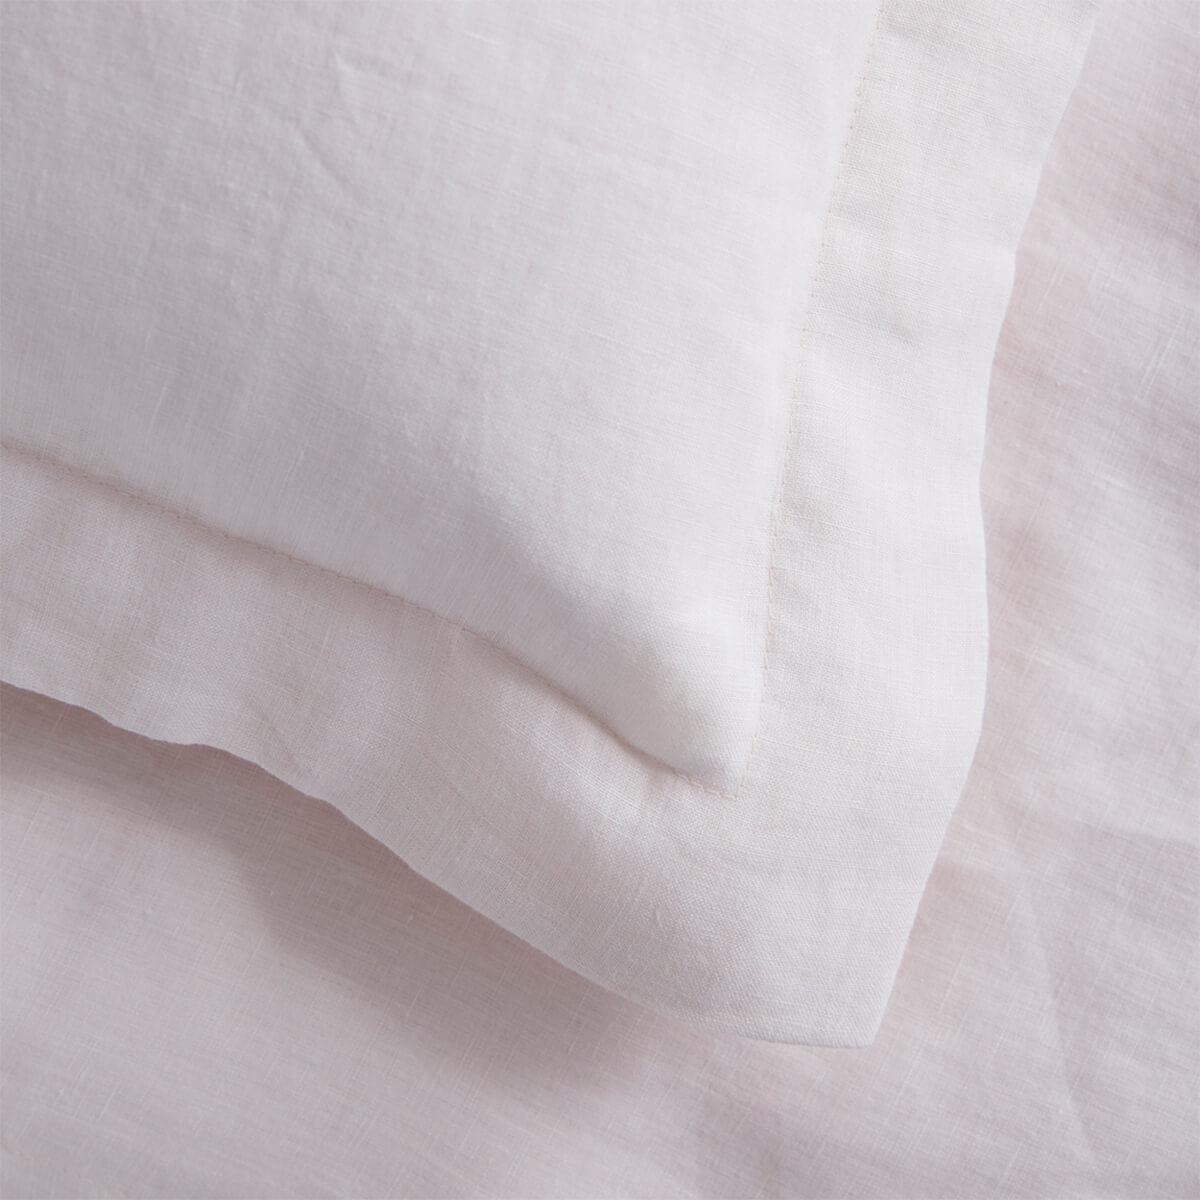 Blush Pink French Linen Standard Oxford Pillowcase Pair